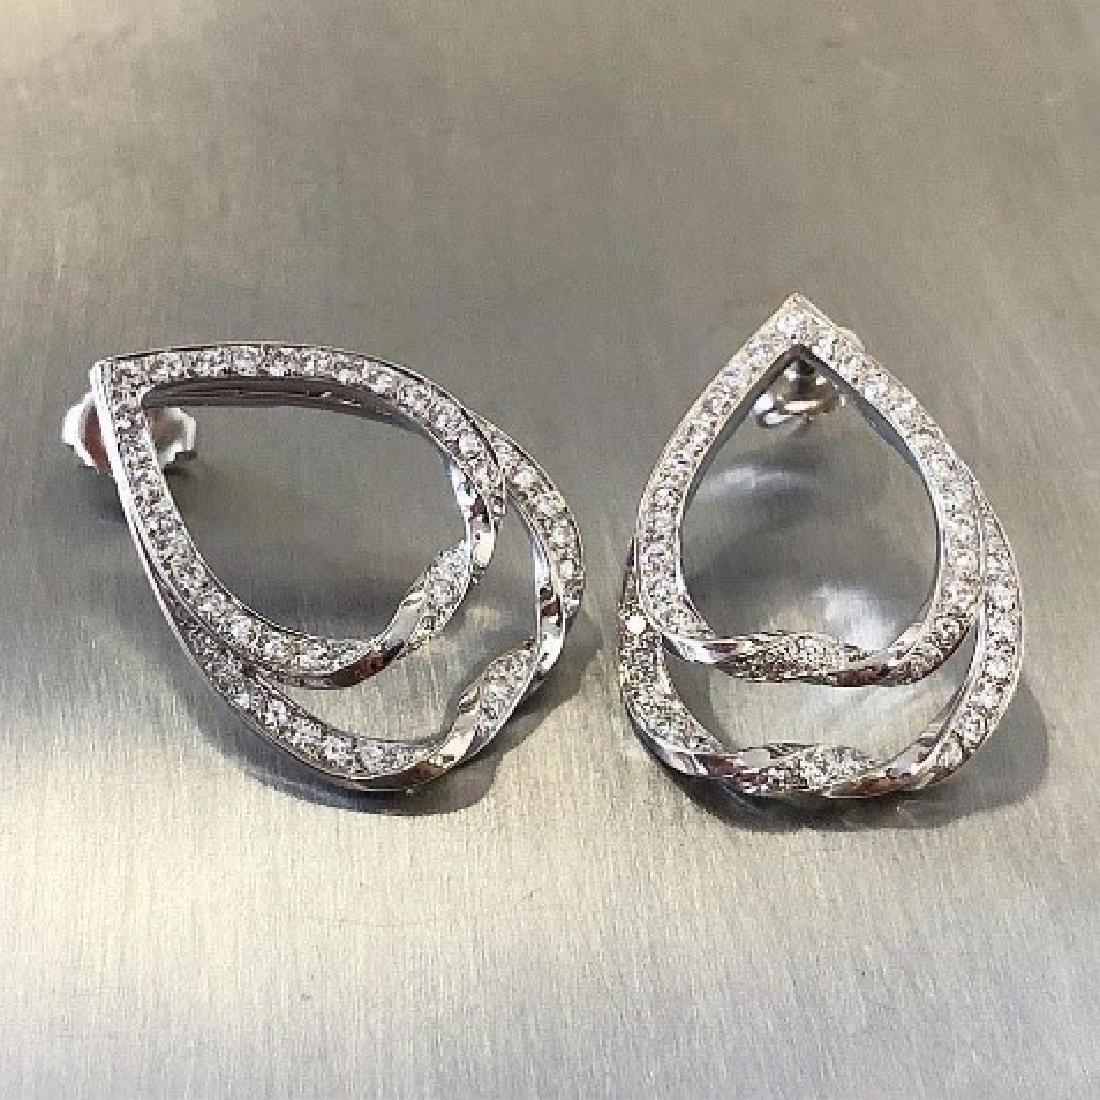 14 karat white gold and diamond earrings. 98 round